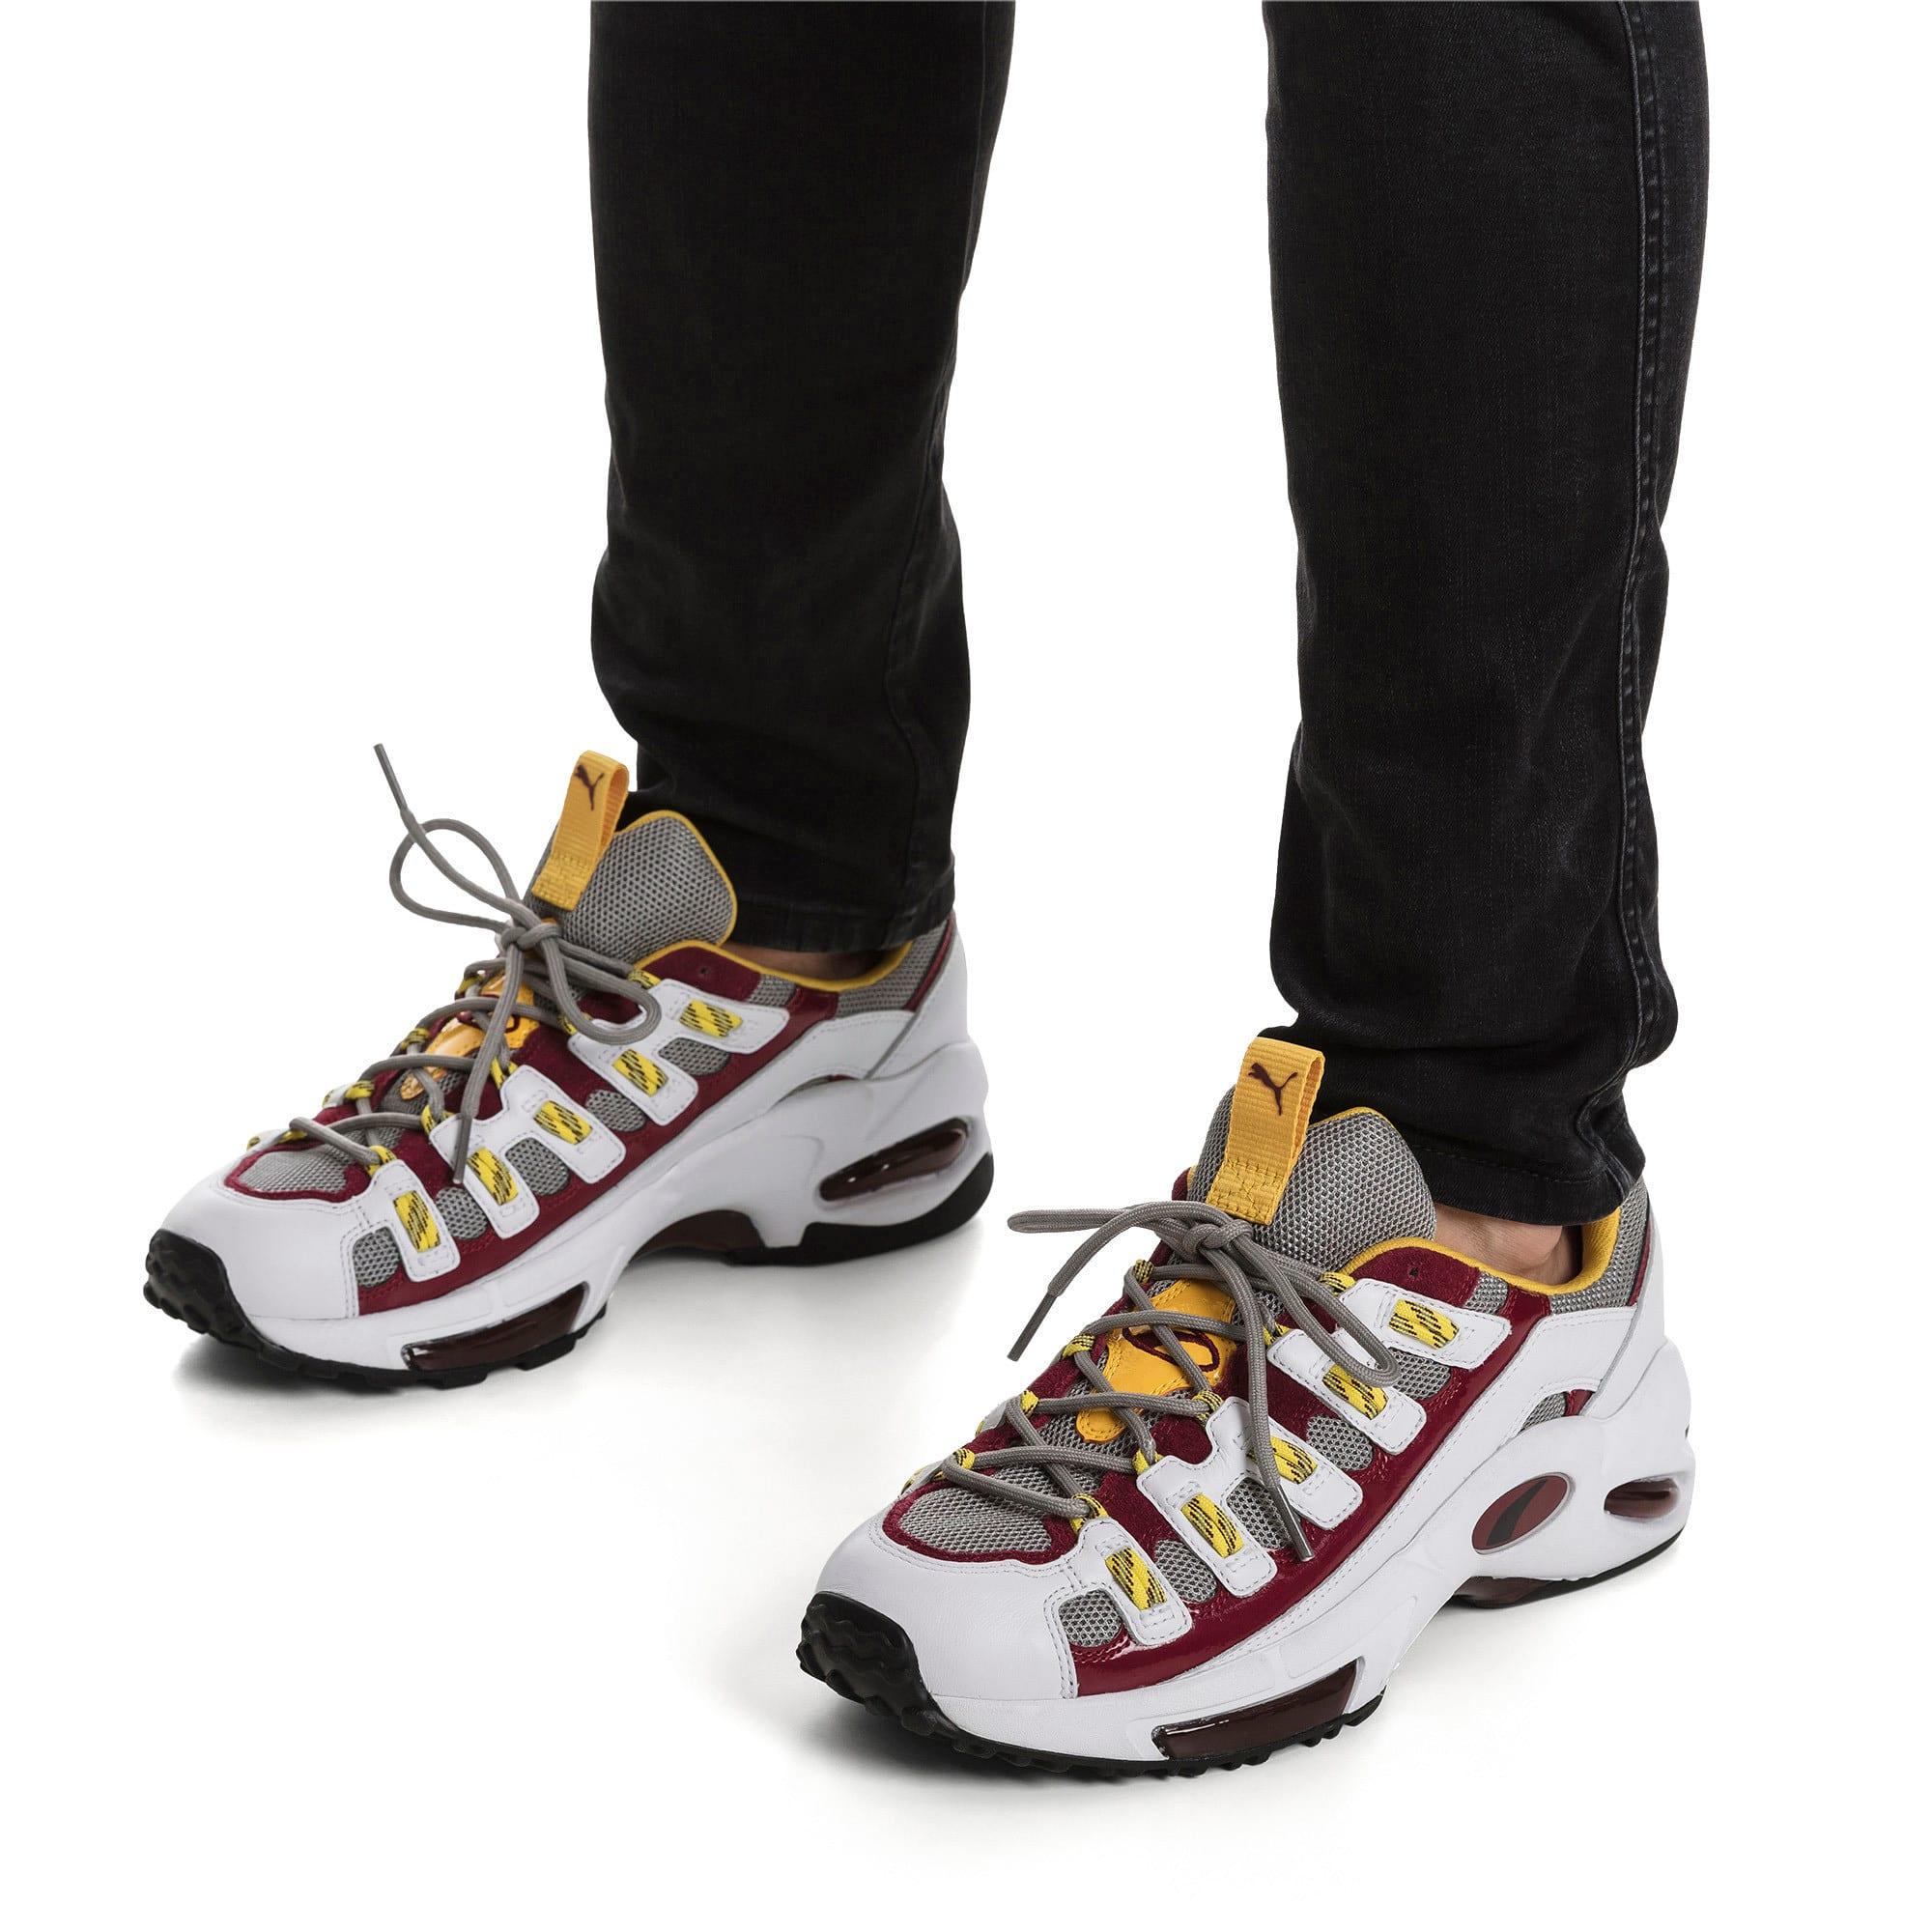 Thumbnail 2 of CELL Endura Patent 98 Men's Sneakers, Limestone-Cordovan, medium